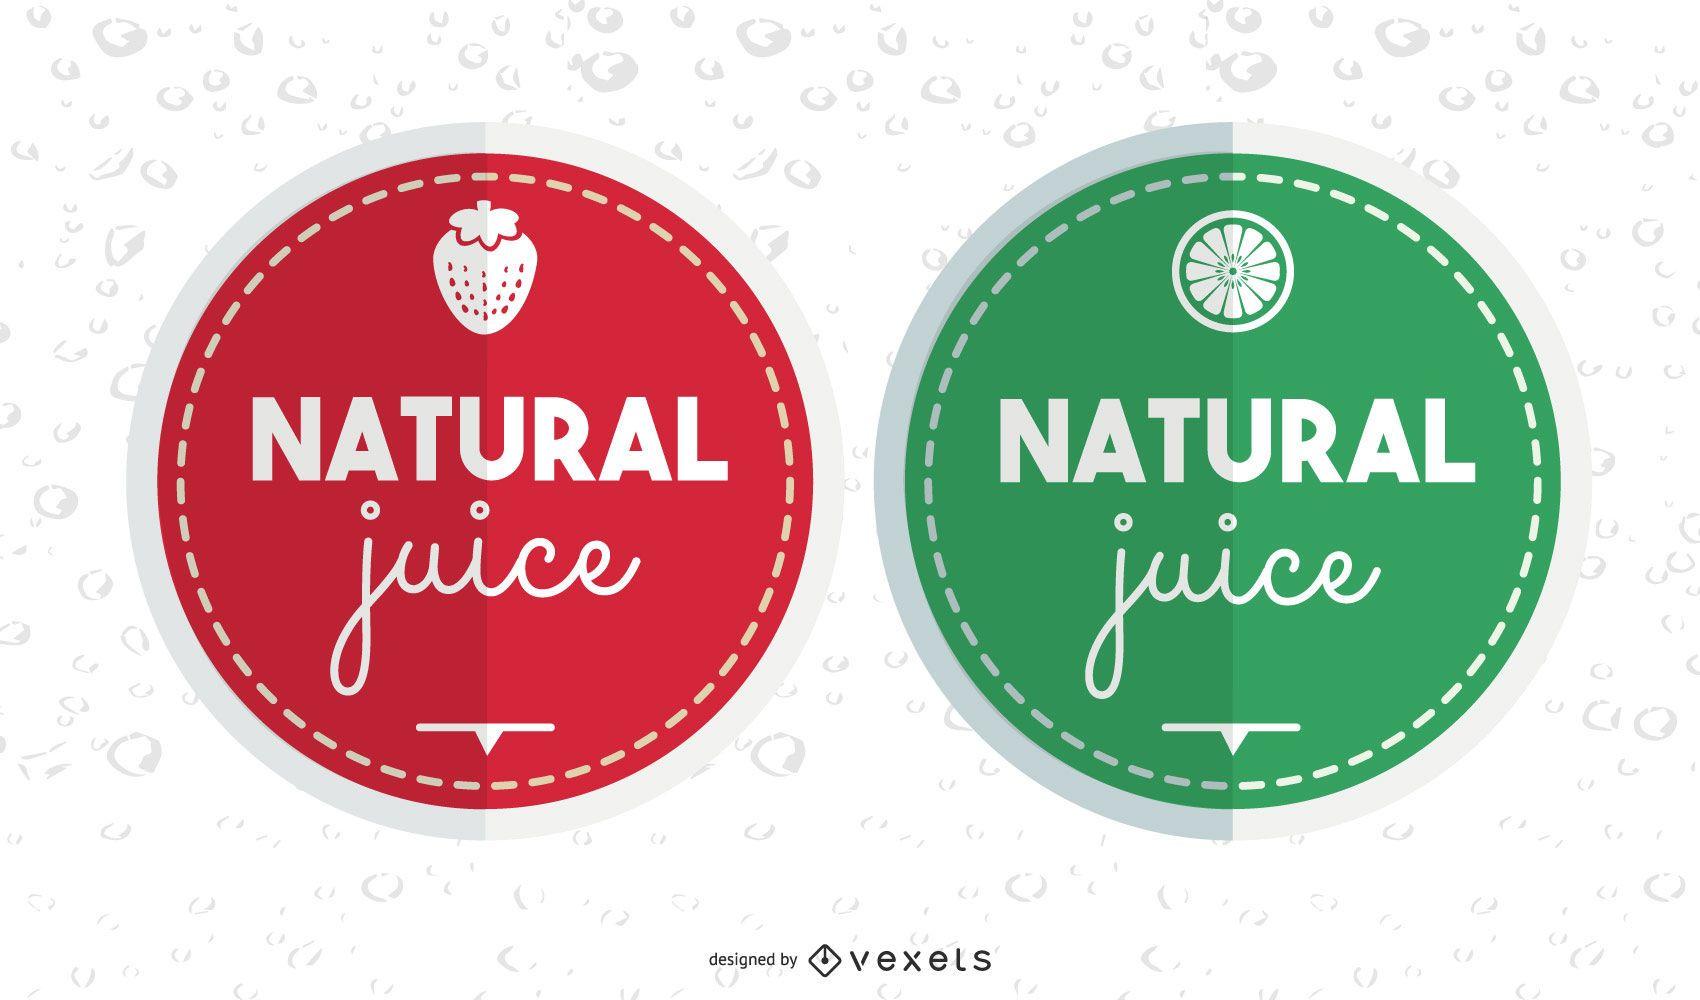 Natural juice labels